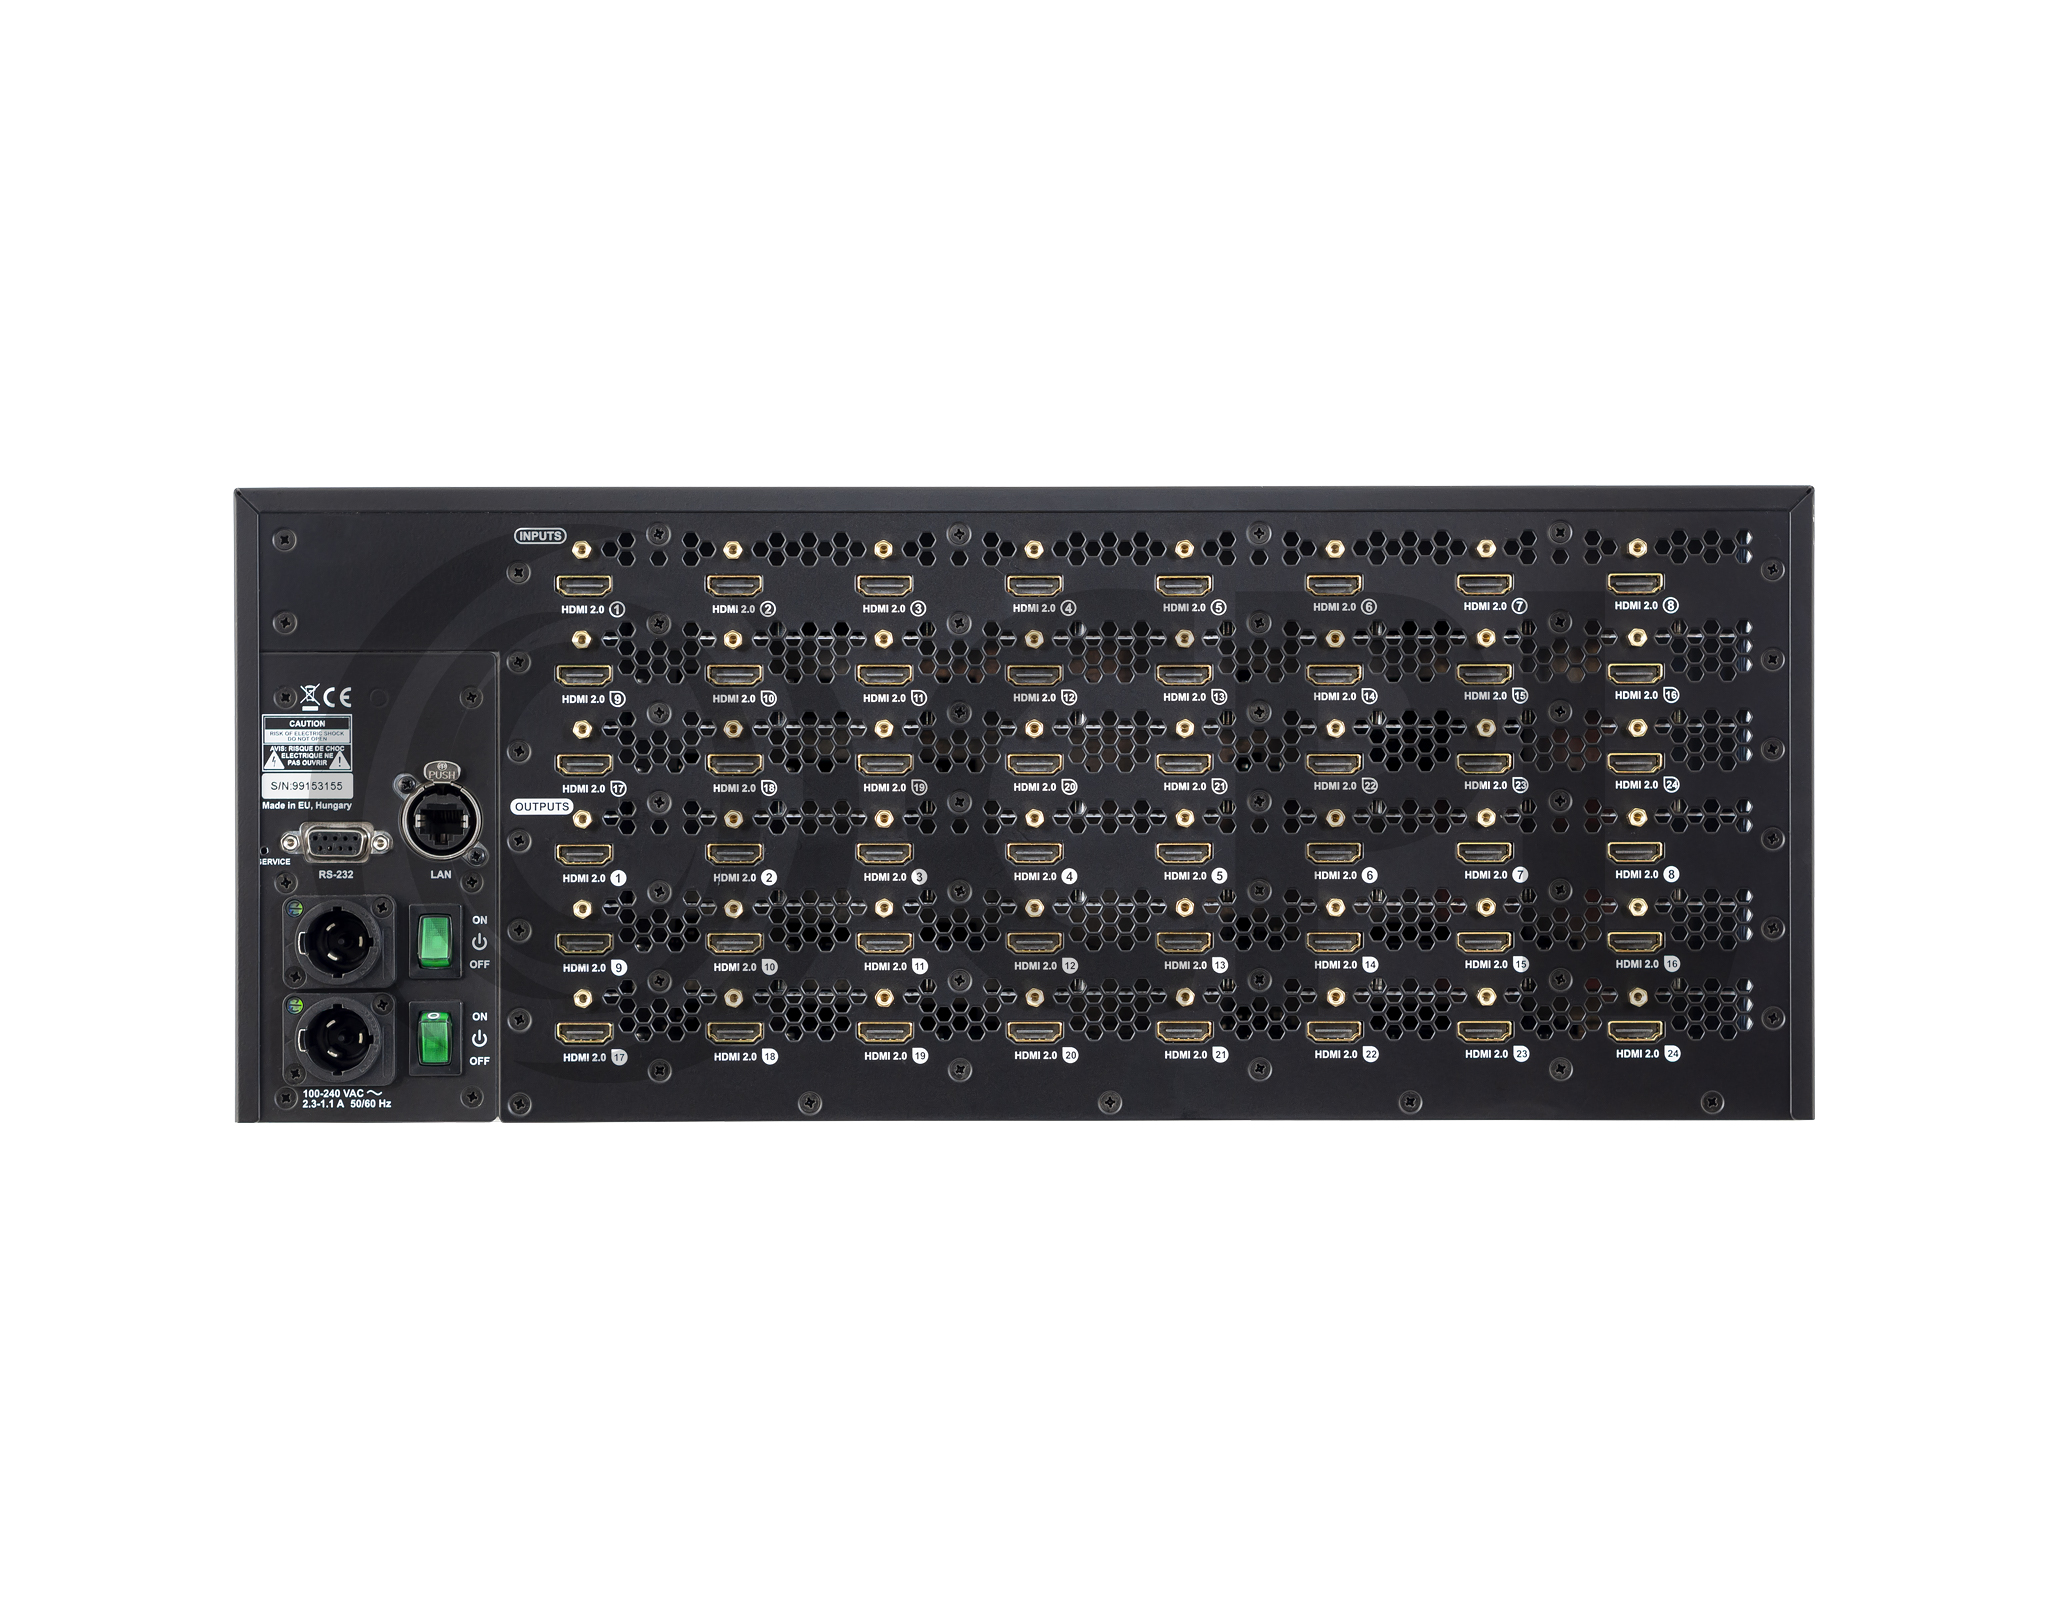 MX2-24x24-HDMI20 Back